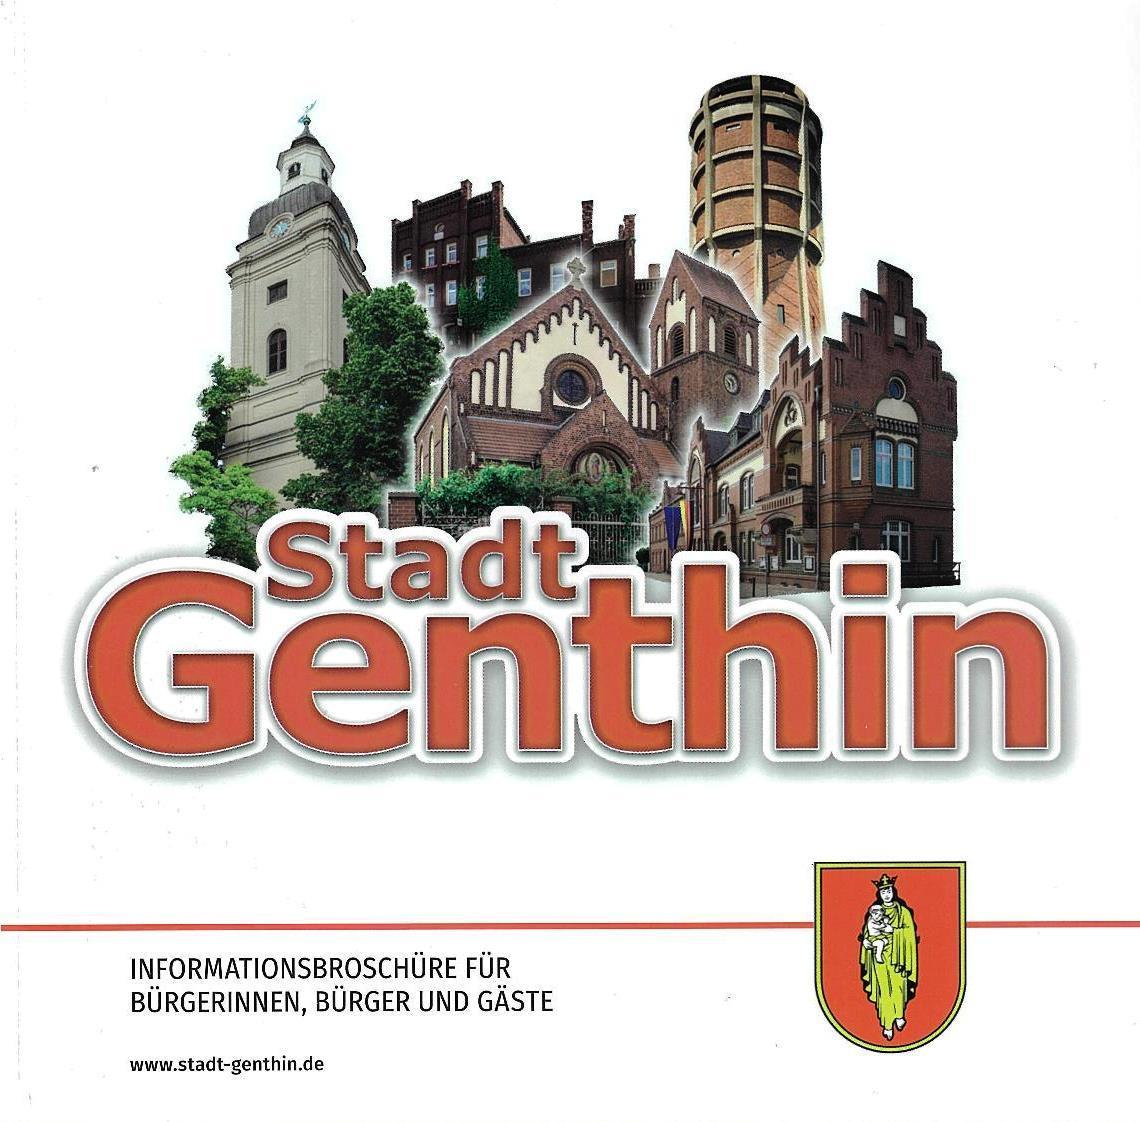 Titelblatt Informationsbroschüre Genthin